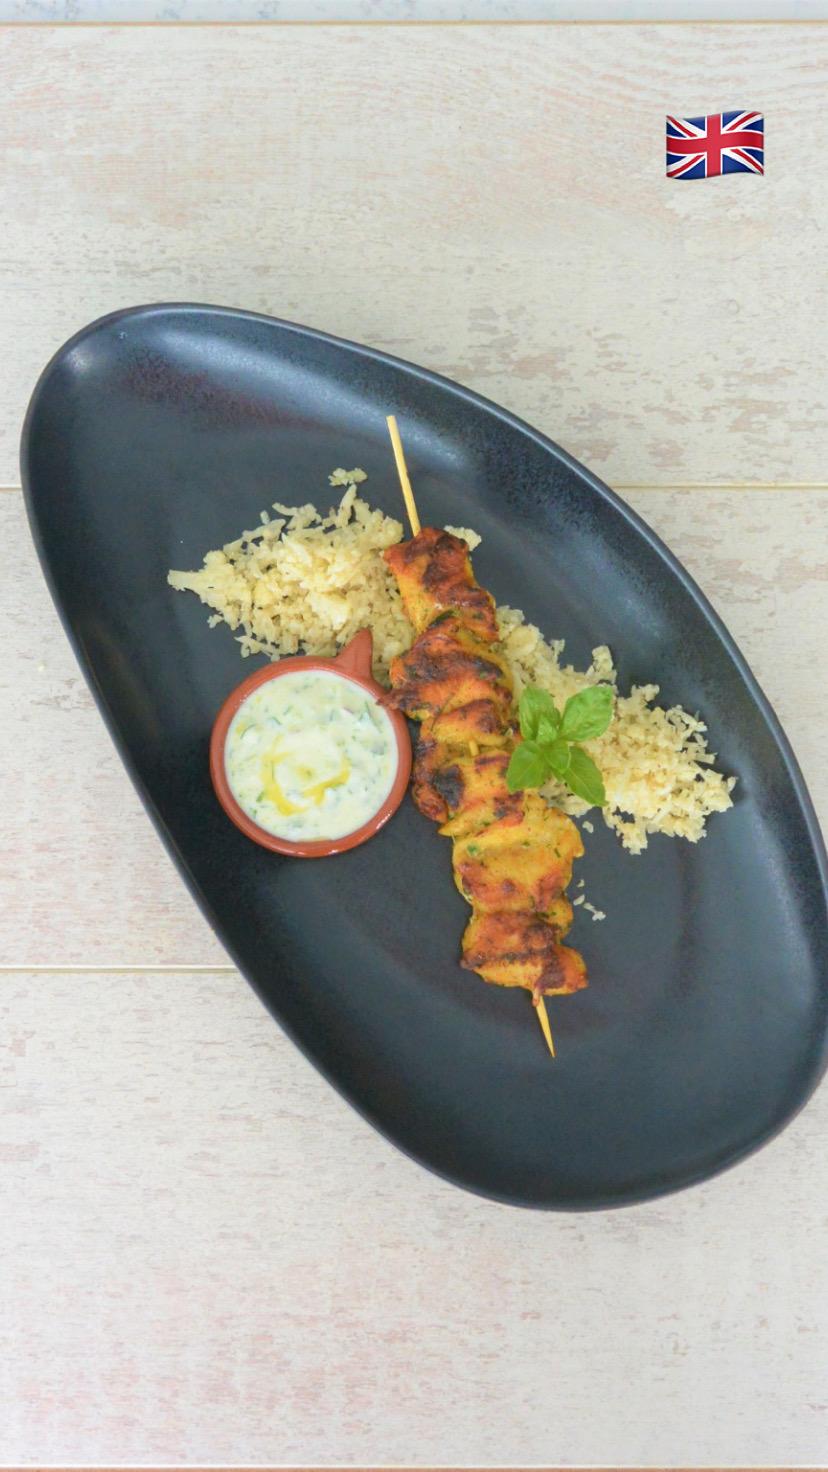 SPICED CHICKEN SKEWERS With cauliflower rice and yoghurt sauce